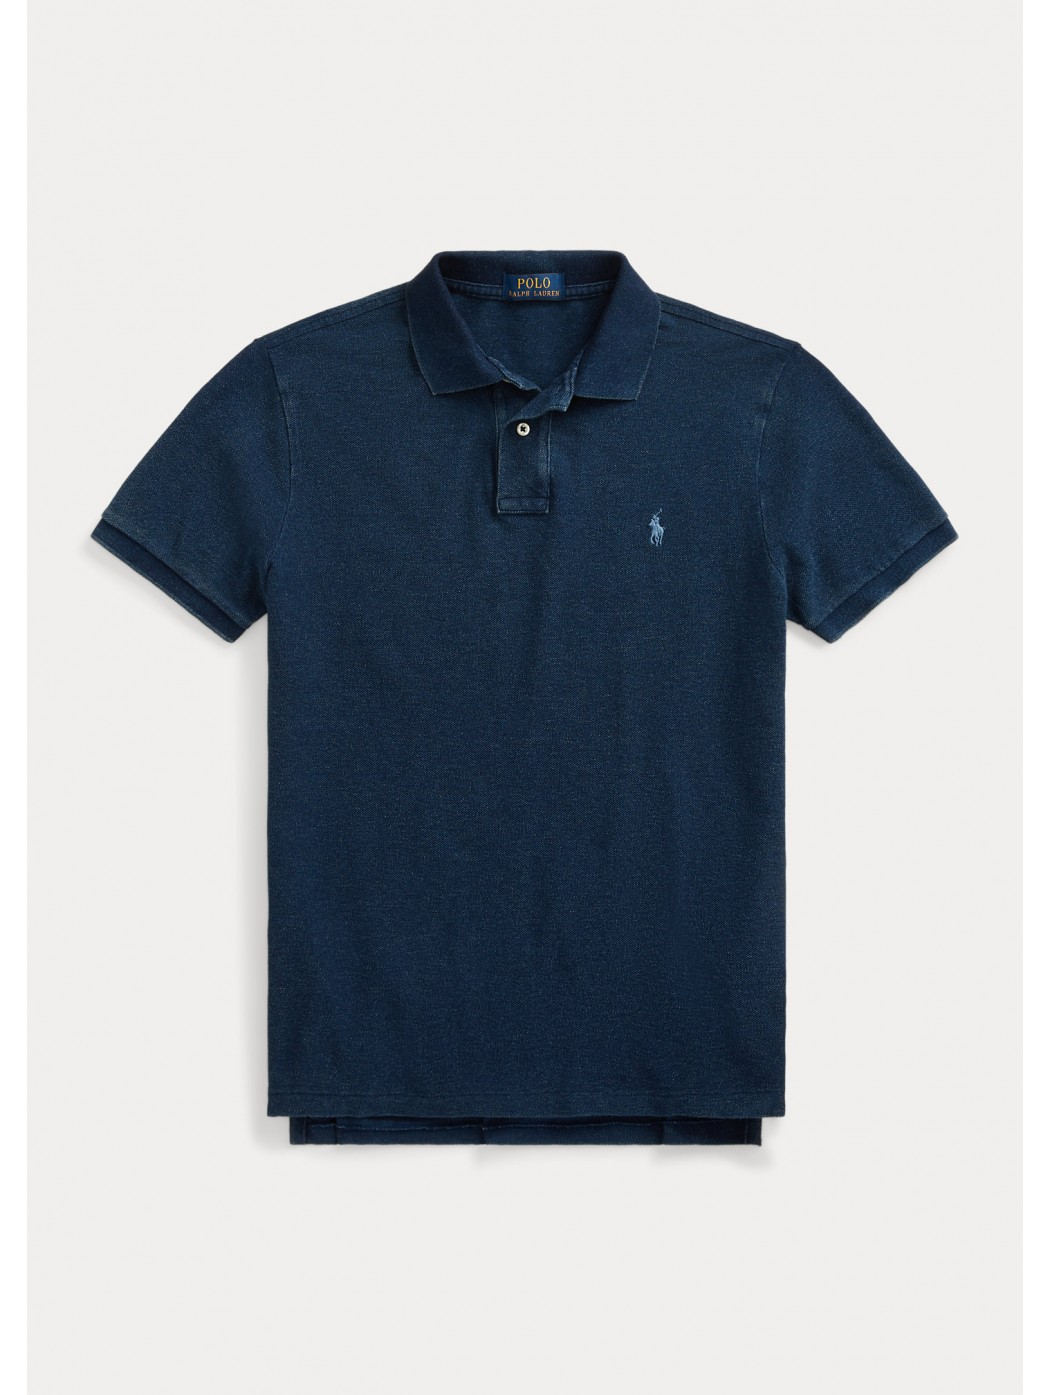 Polo in piqu' Custom Slim-Fit POLO RALPH LAUREN UOMO 710814416 007